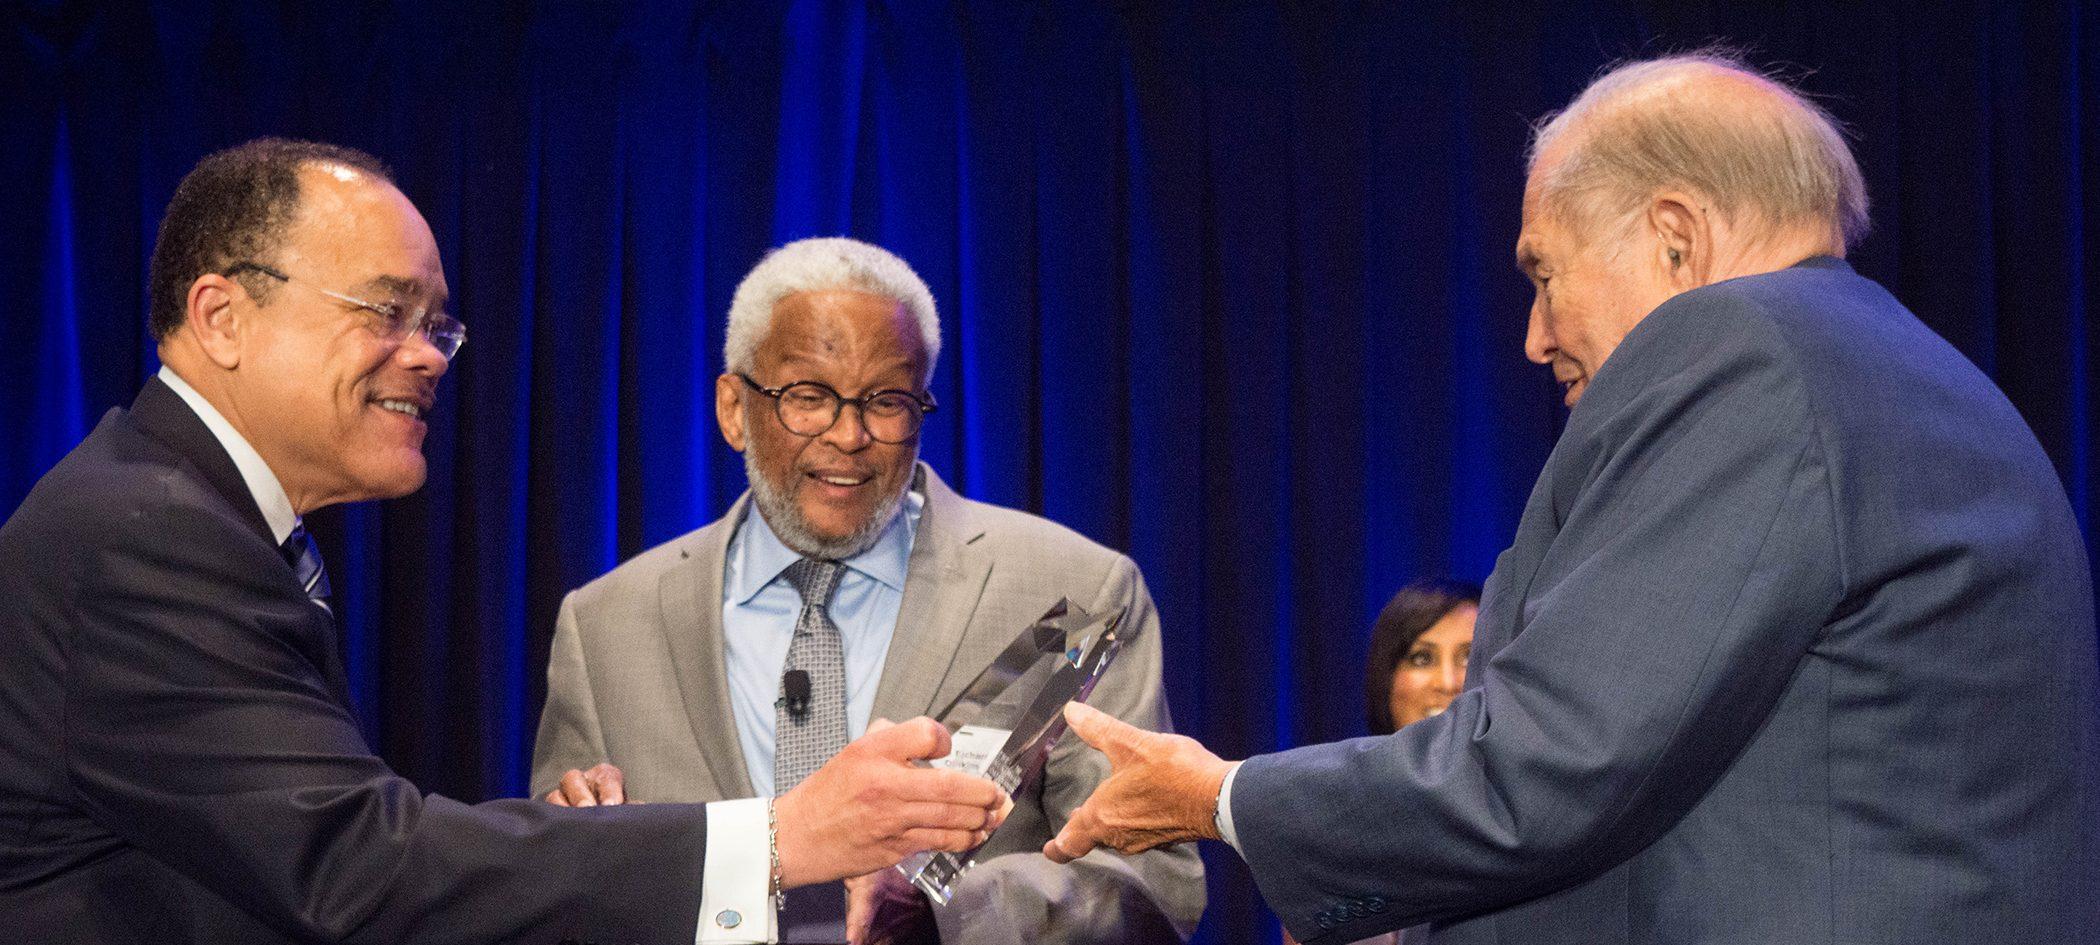 Desegregation Efforts Recognized at Bridge to Equality